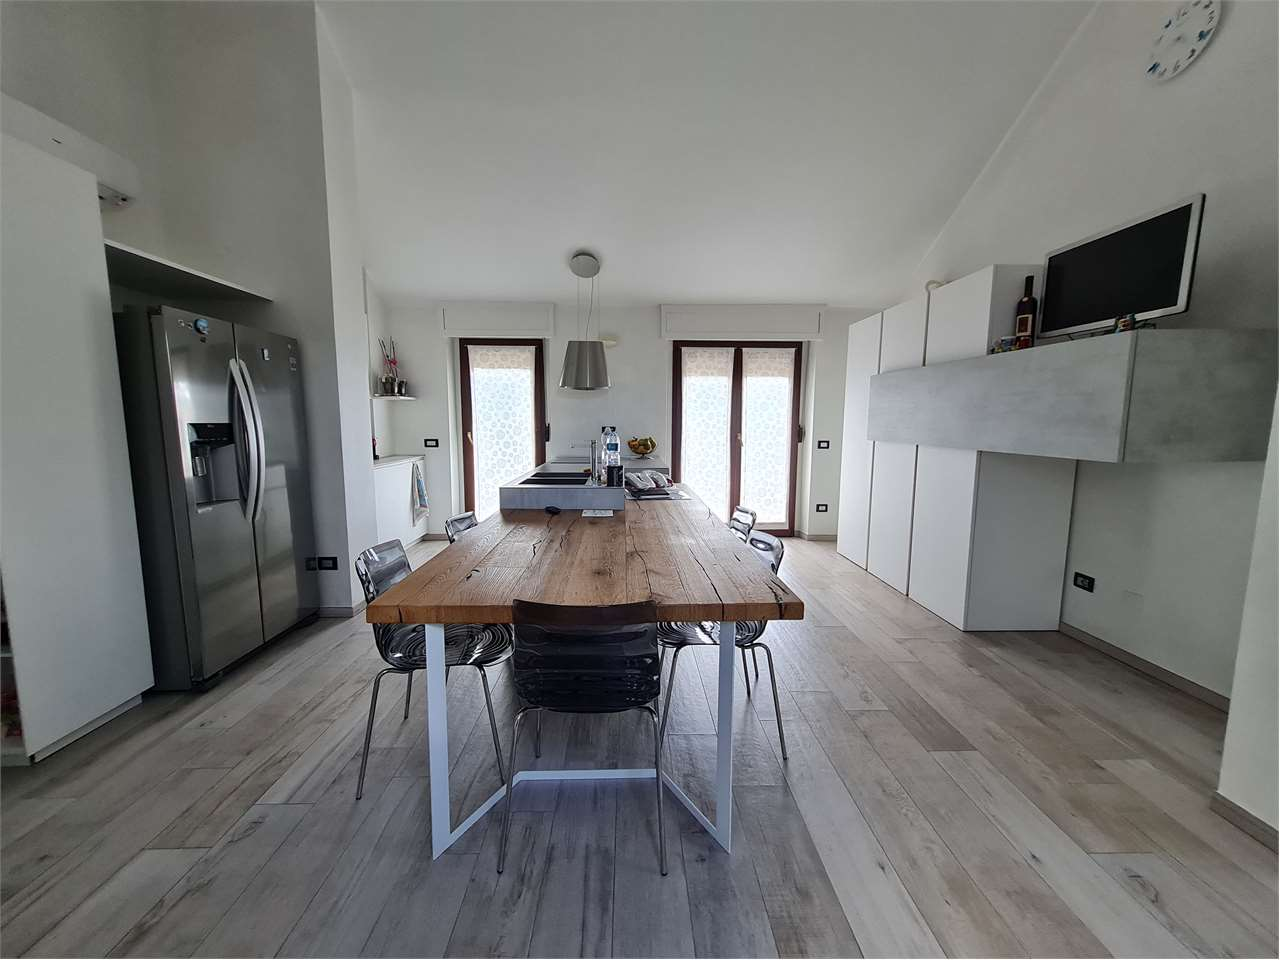 Vendita Attico Appartamento Chieri via trofarello 9 266224